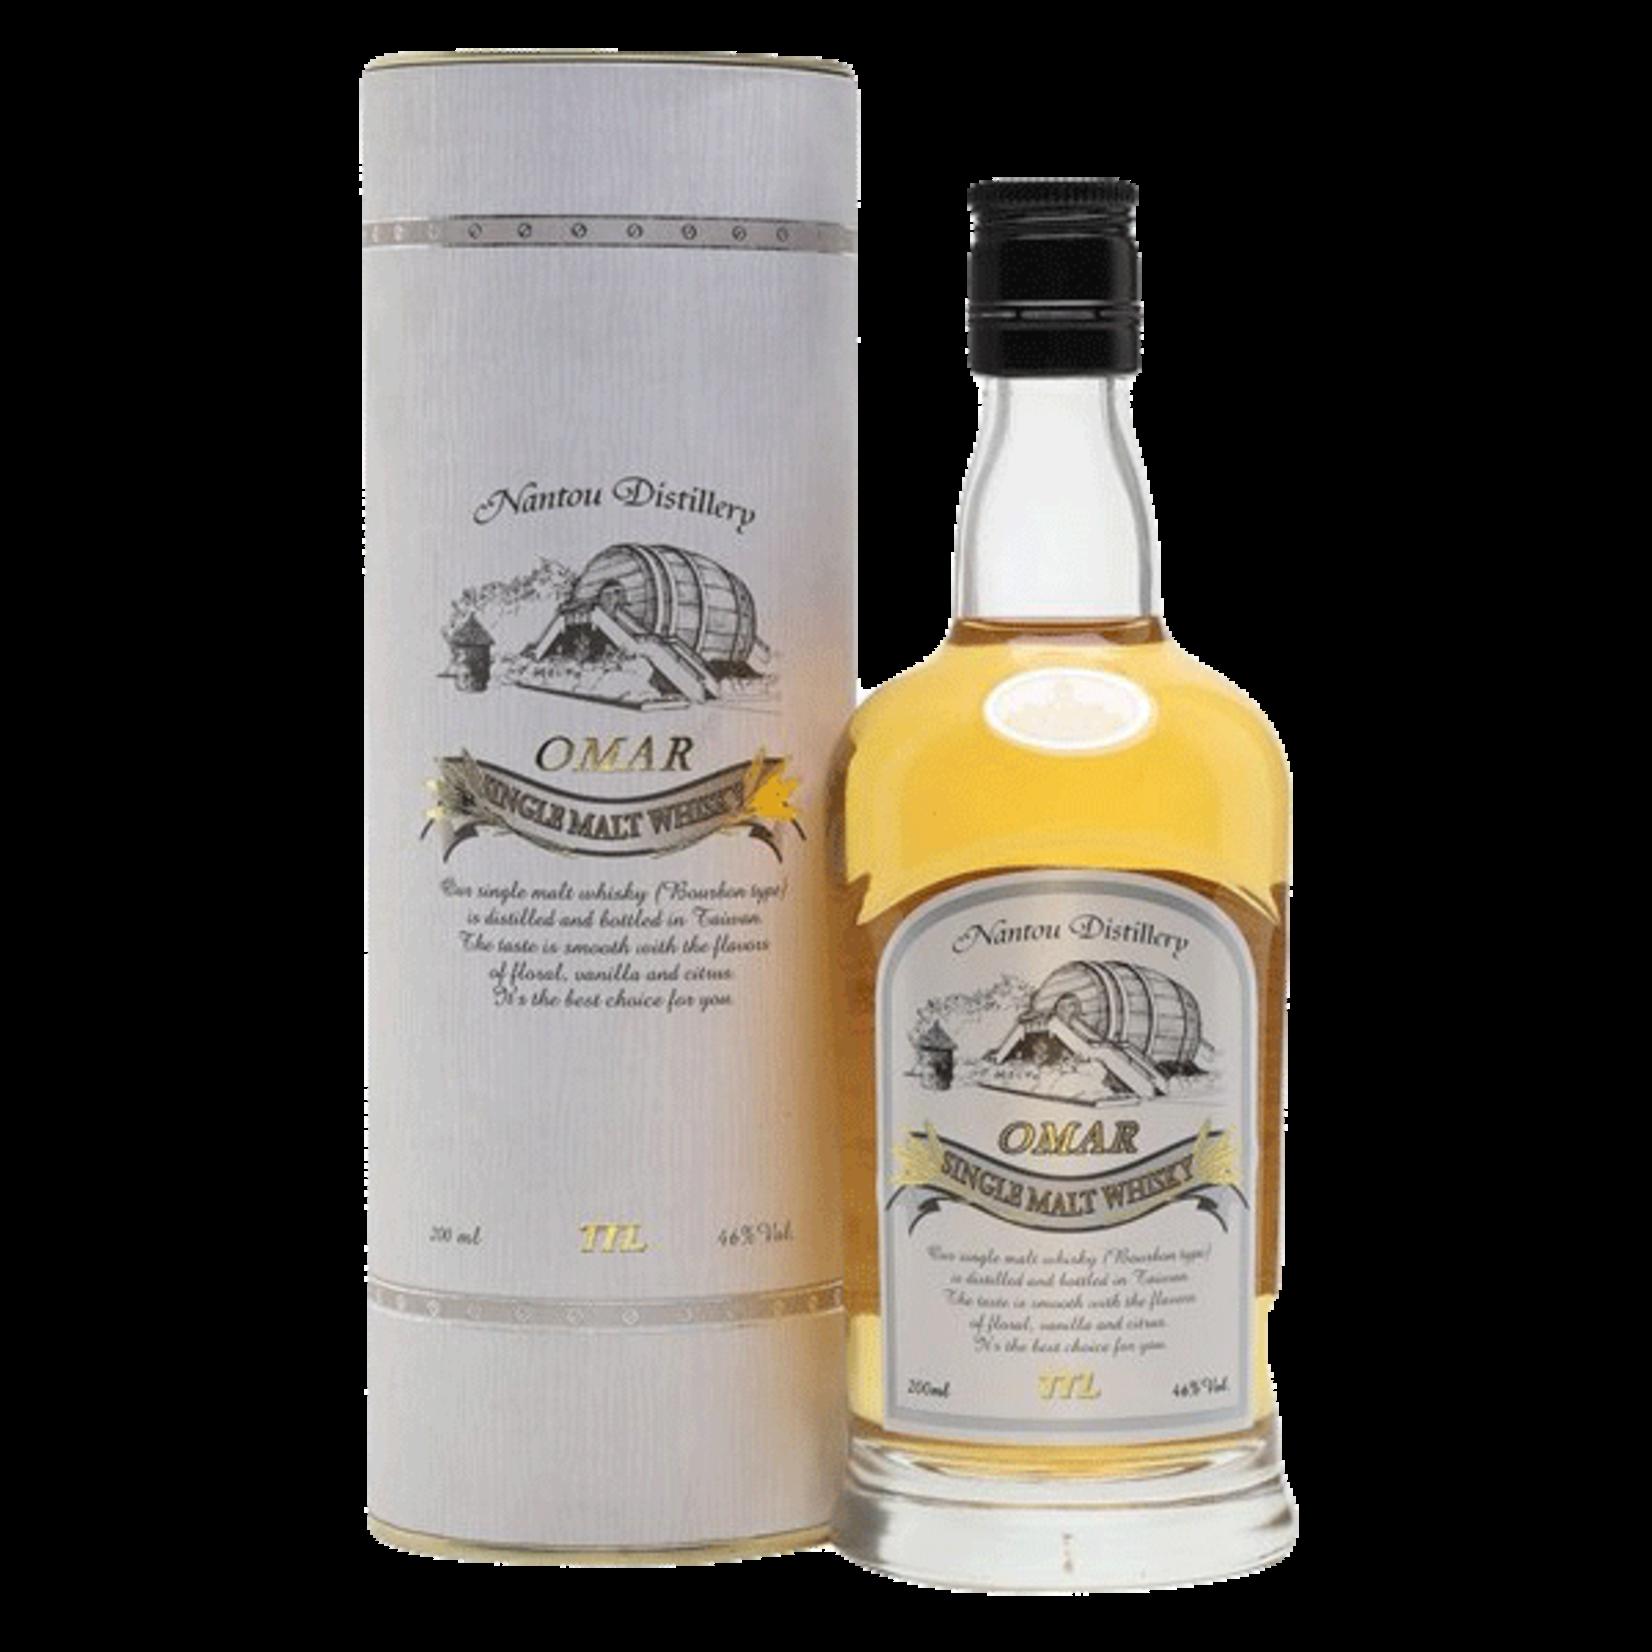 Spirits Omar Single Malt Whiskey Bourbon Barrel Finish Taiwanese Whisky (NV)